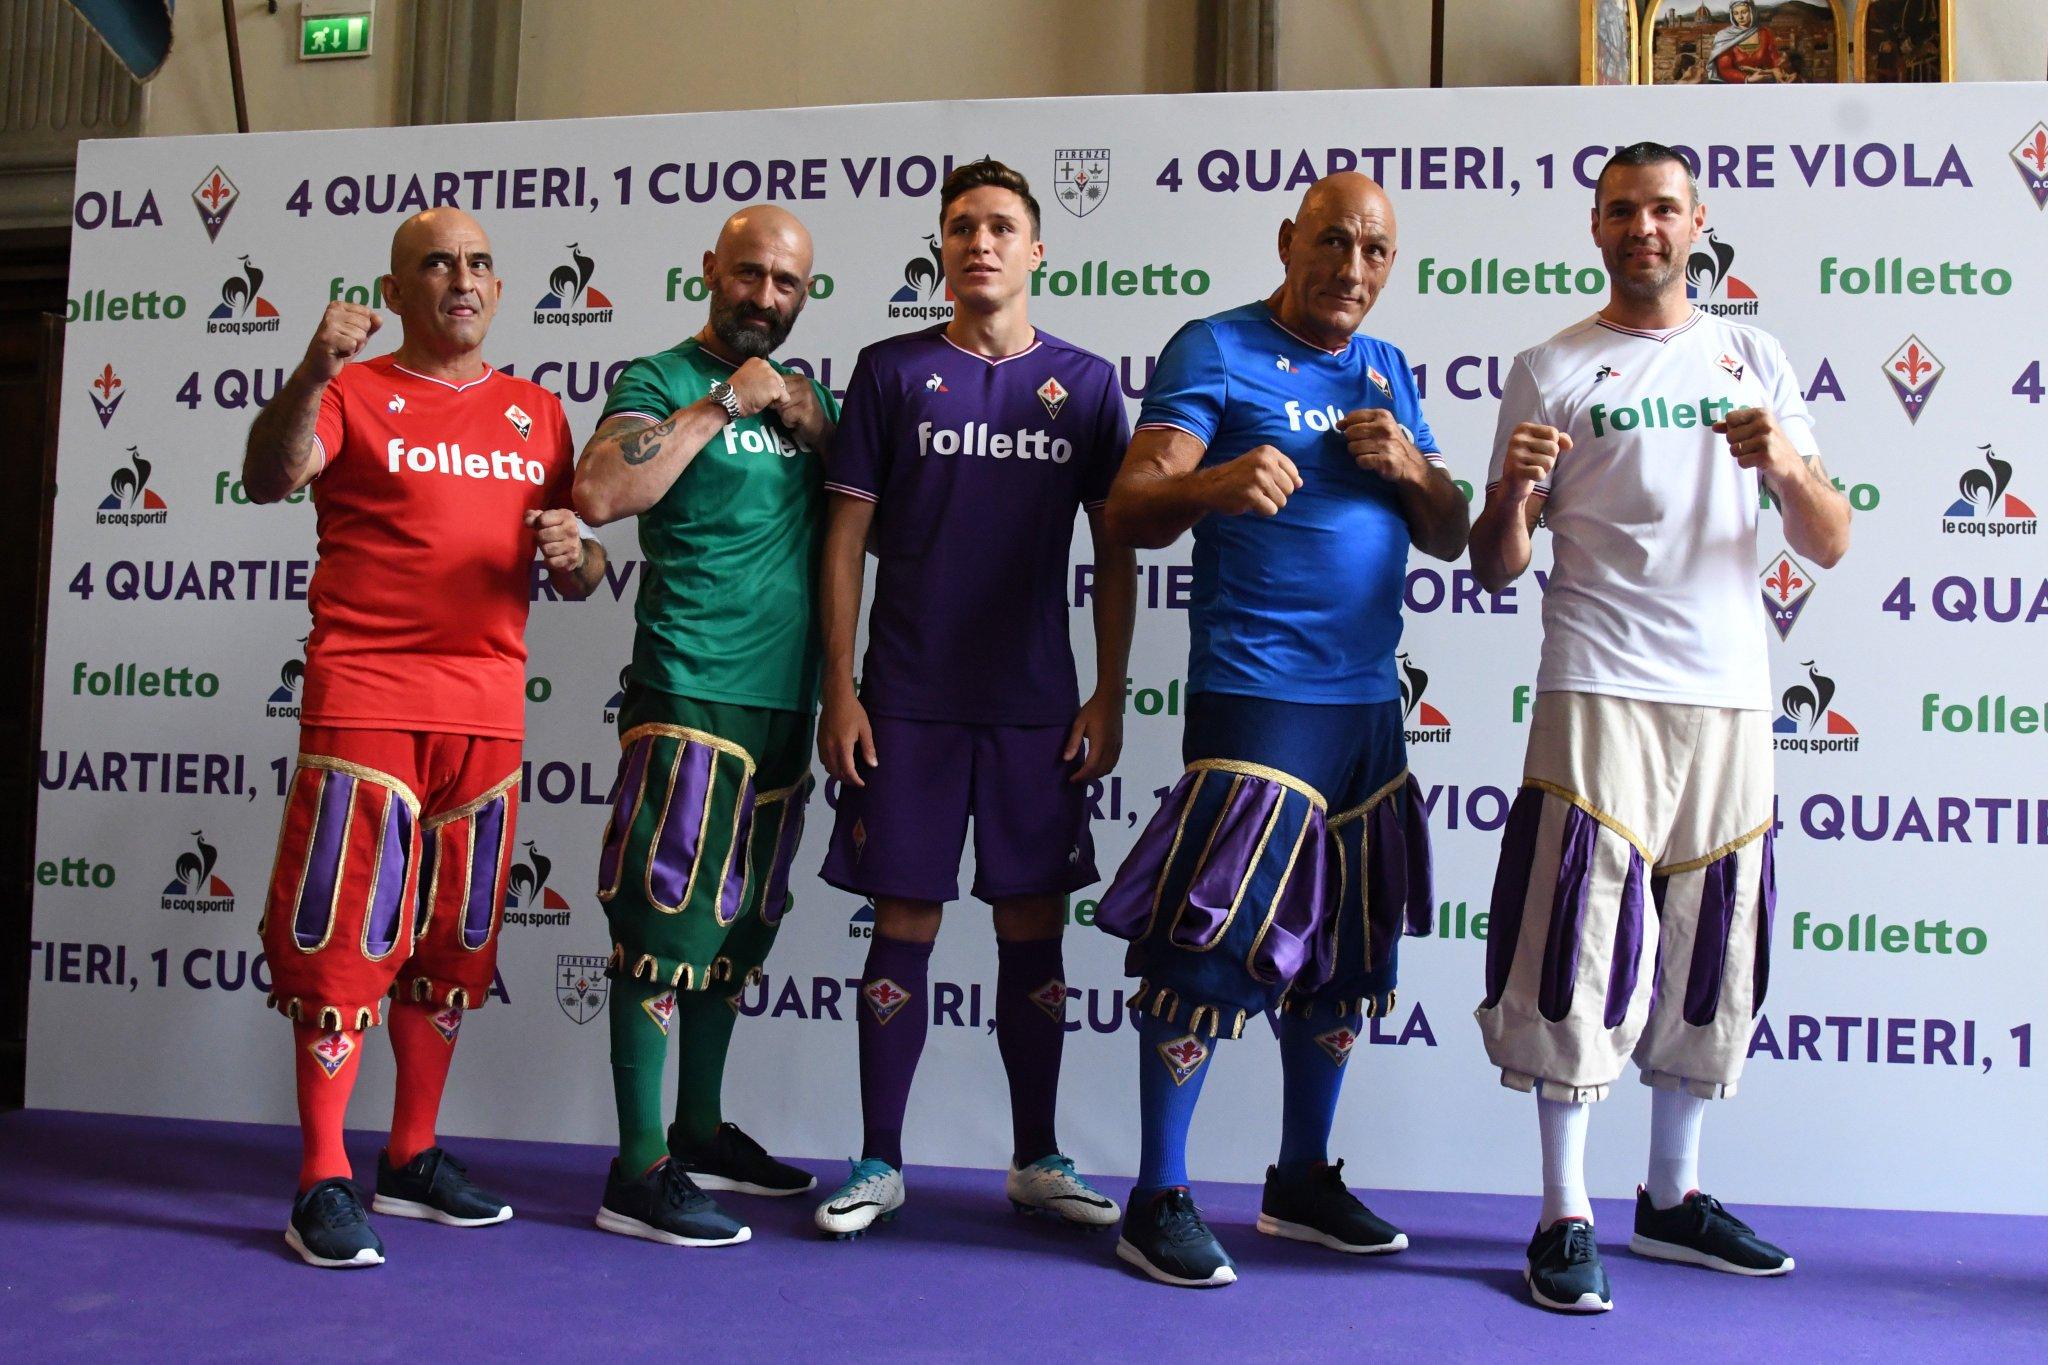 ACF Fiorentina 4k Ultra HD Wallpaper   Background Image